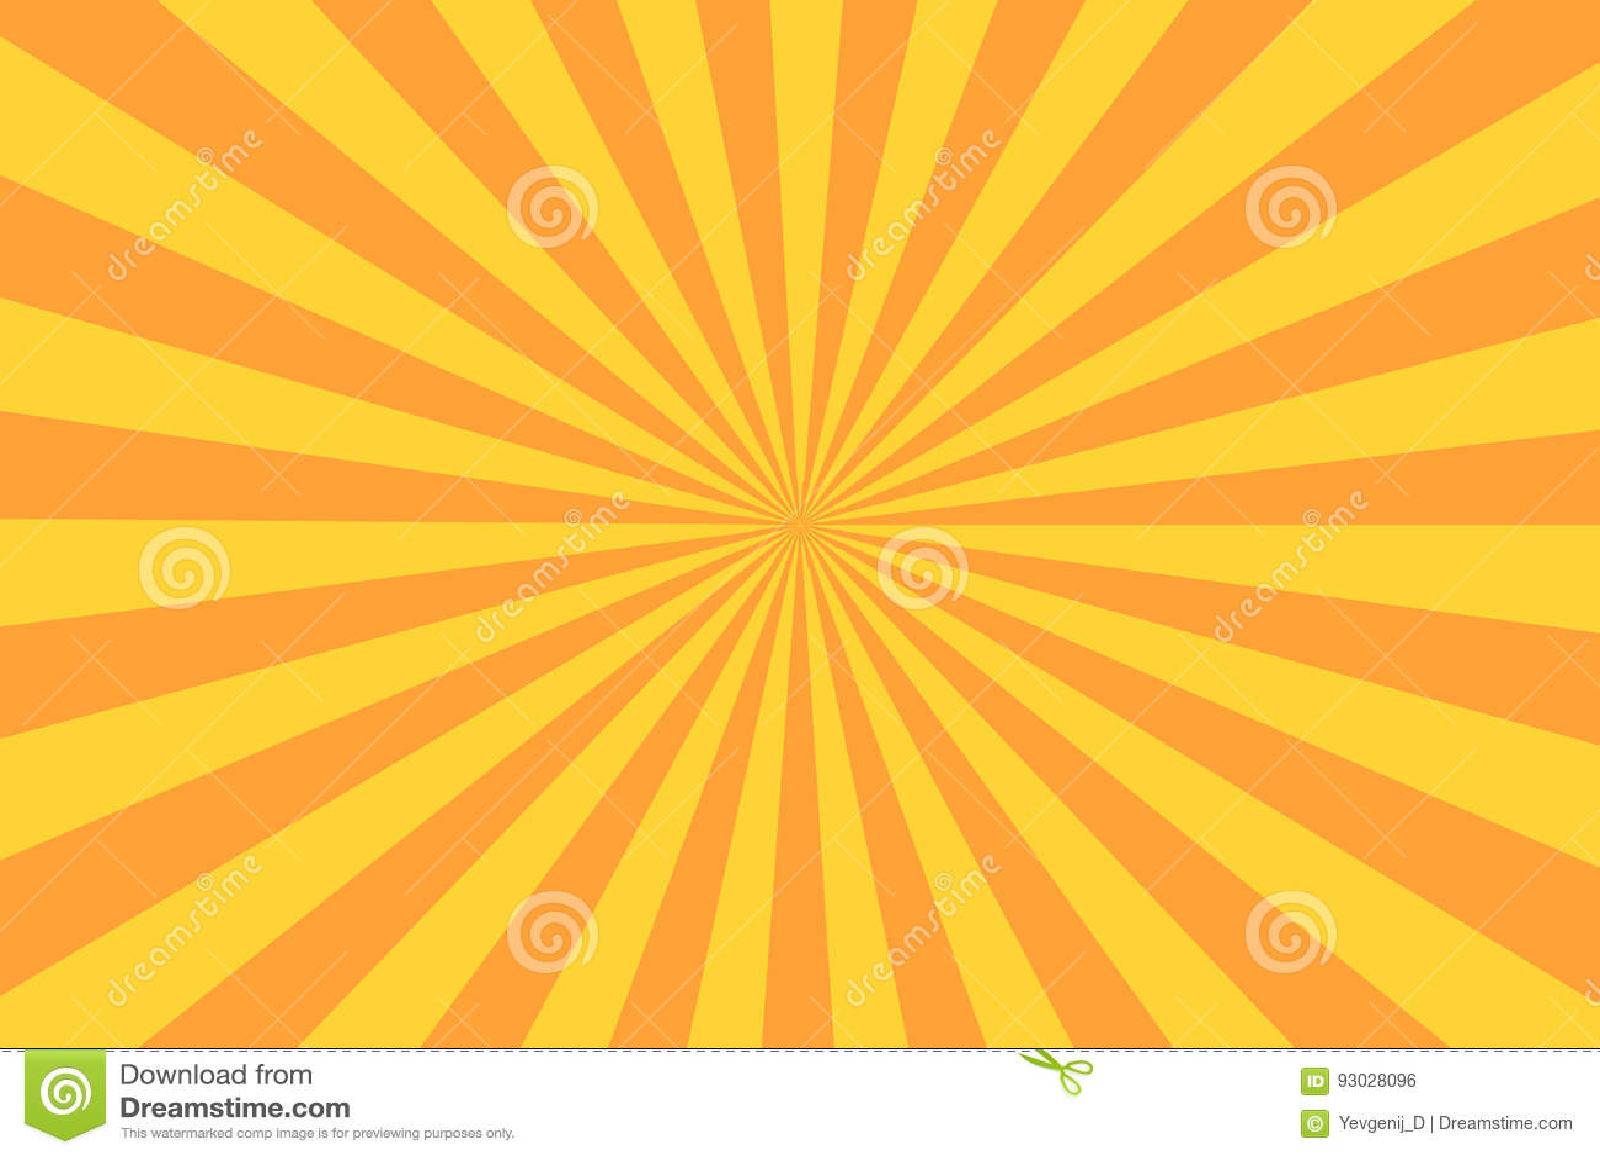 Raio retro do sunburst no estilo do vintage Fundo abstrato da banda desenhada